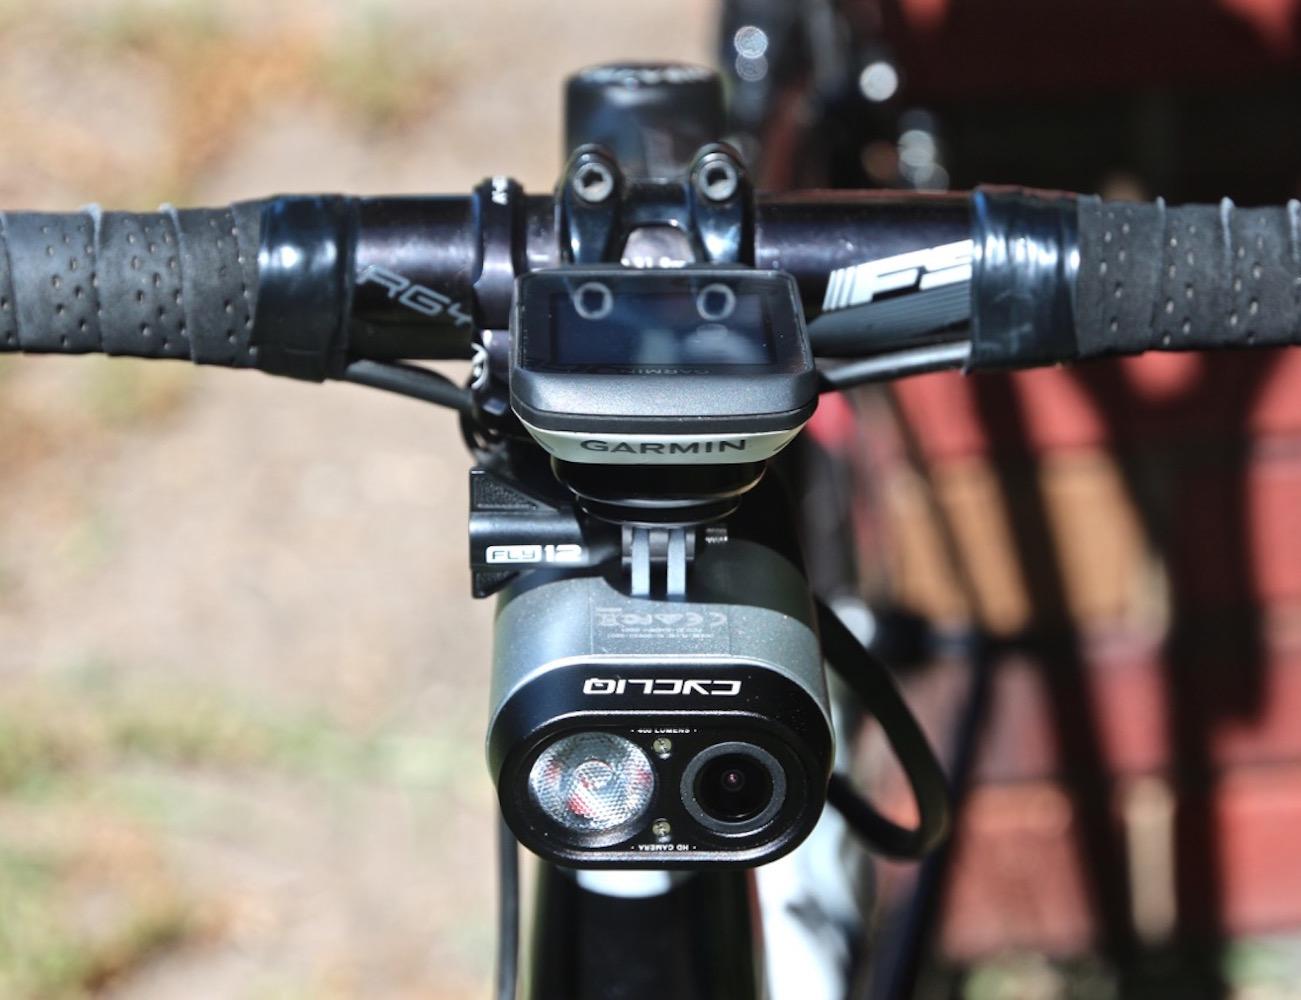 Cycliq Fly12 Camera and Bike Light